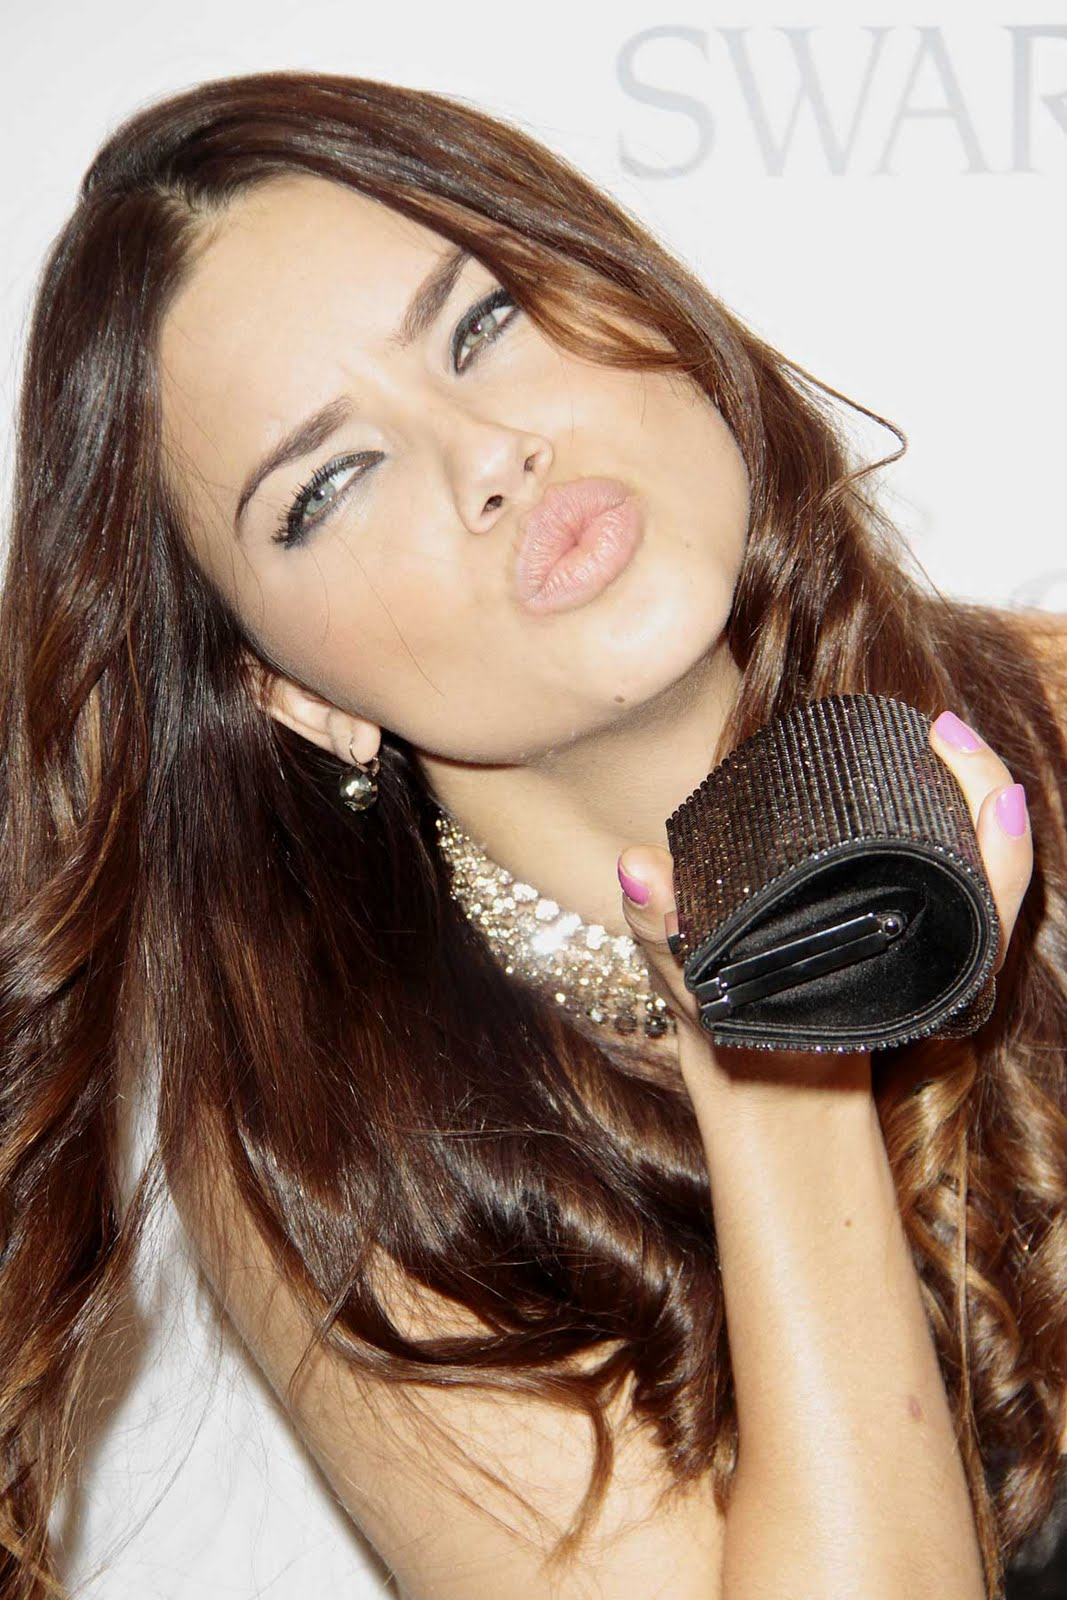 http://1.bp.blogspot.com/_zbsfJpJk1lA/TAAWnnqE1AI/AAAAAAAALWU/3KtFZ74Gg5w/s1600/adriana_lima_kiss.jpg